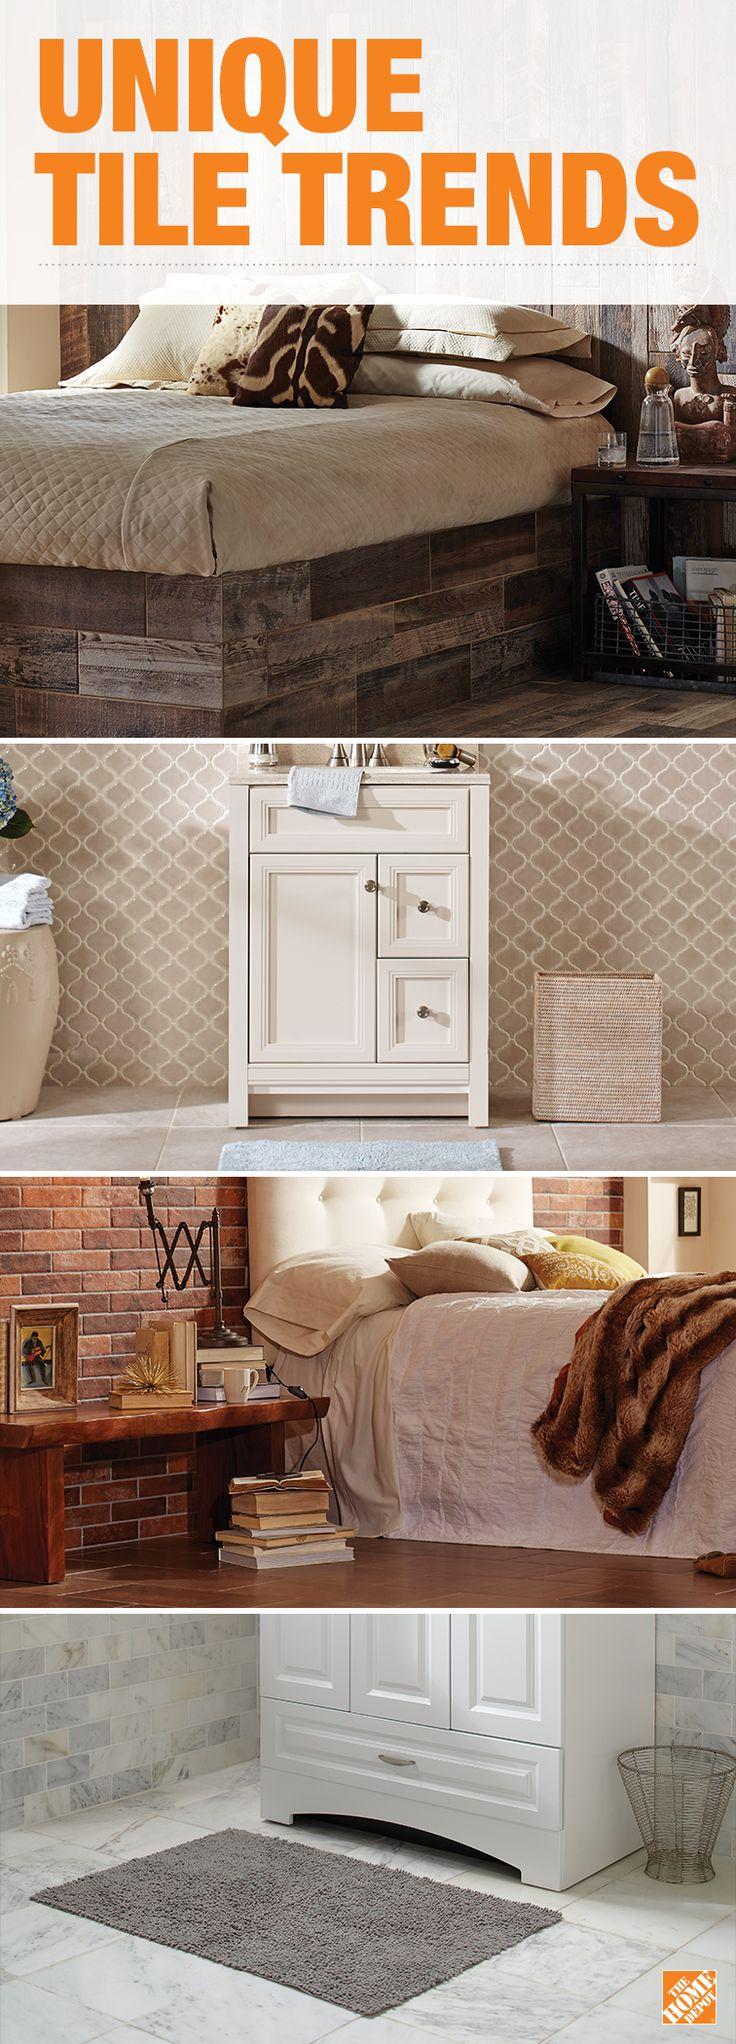 Home Depot Tiles For Kitchen